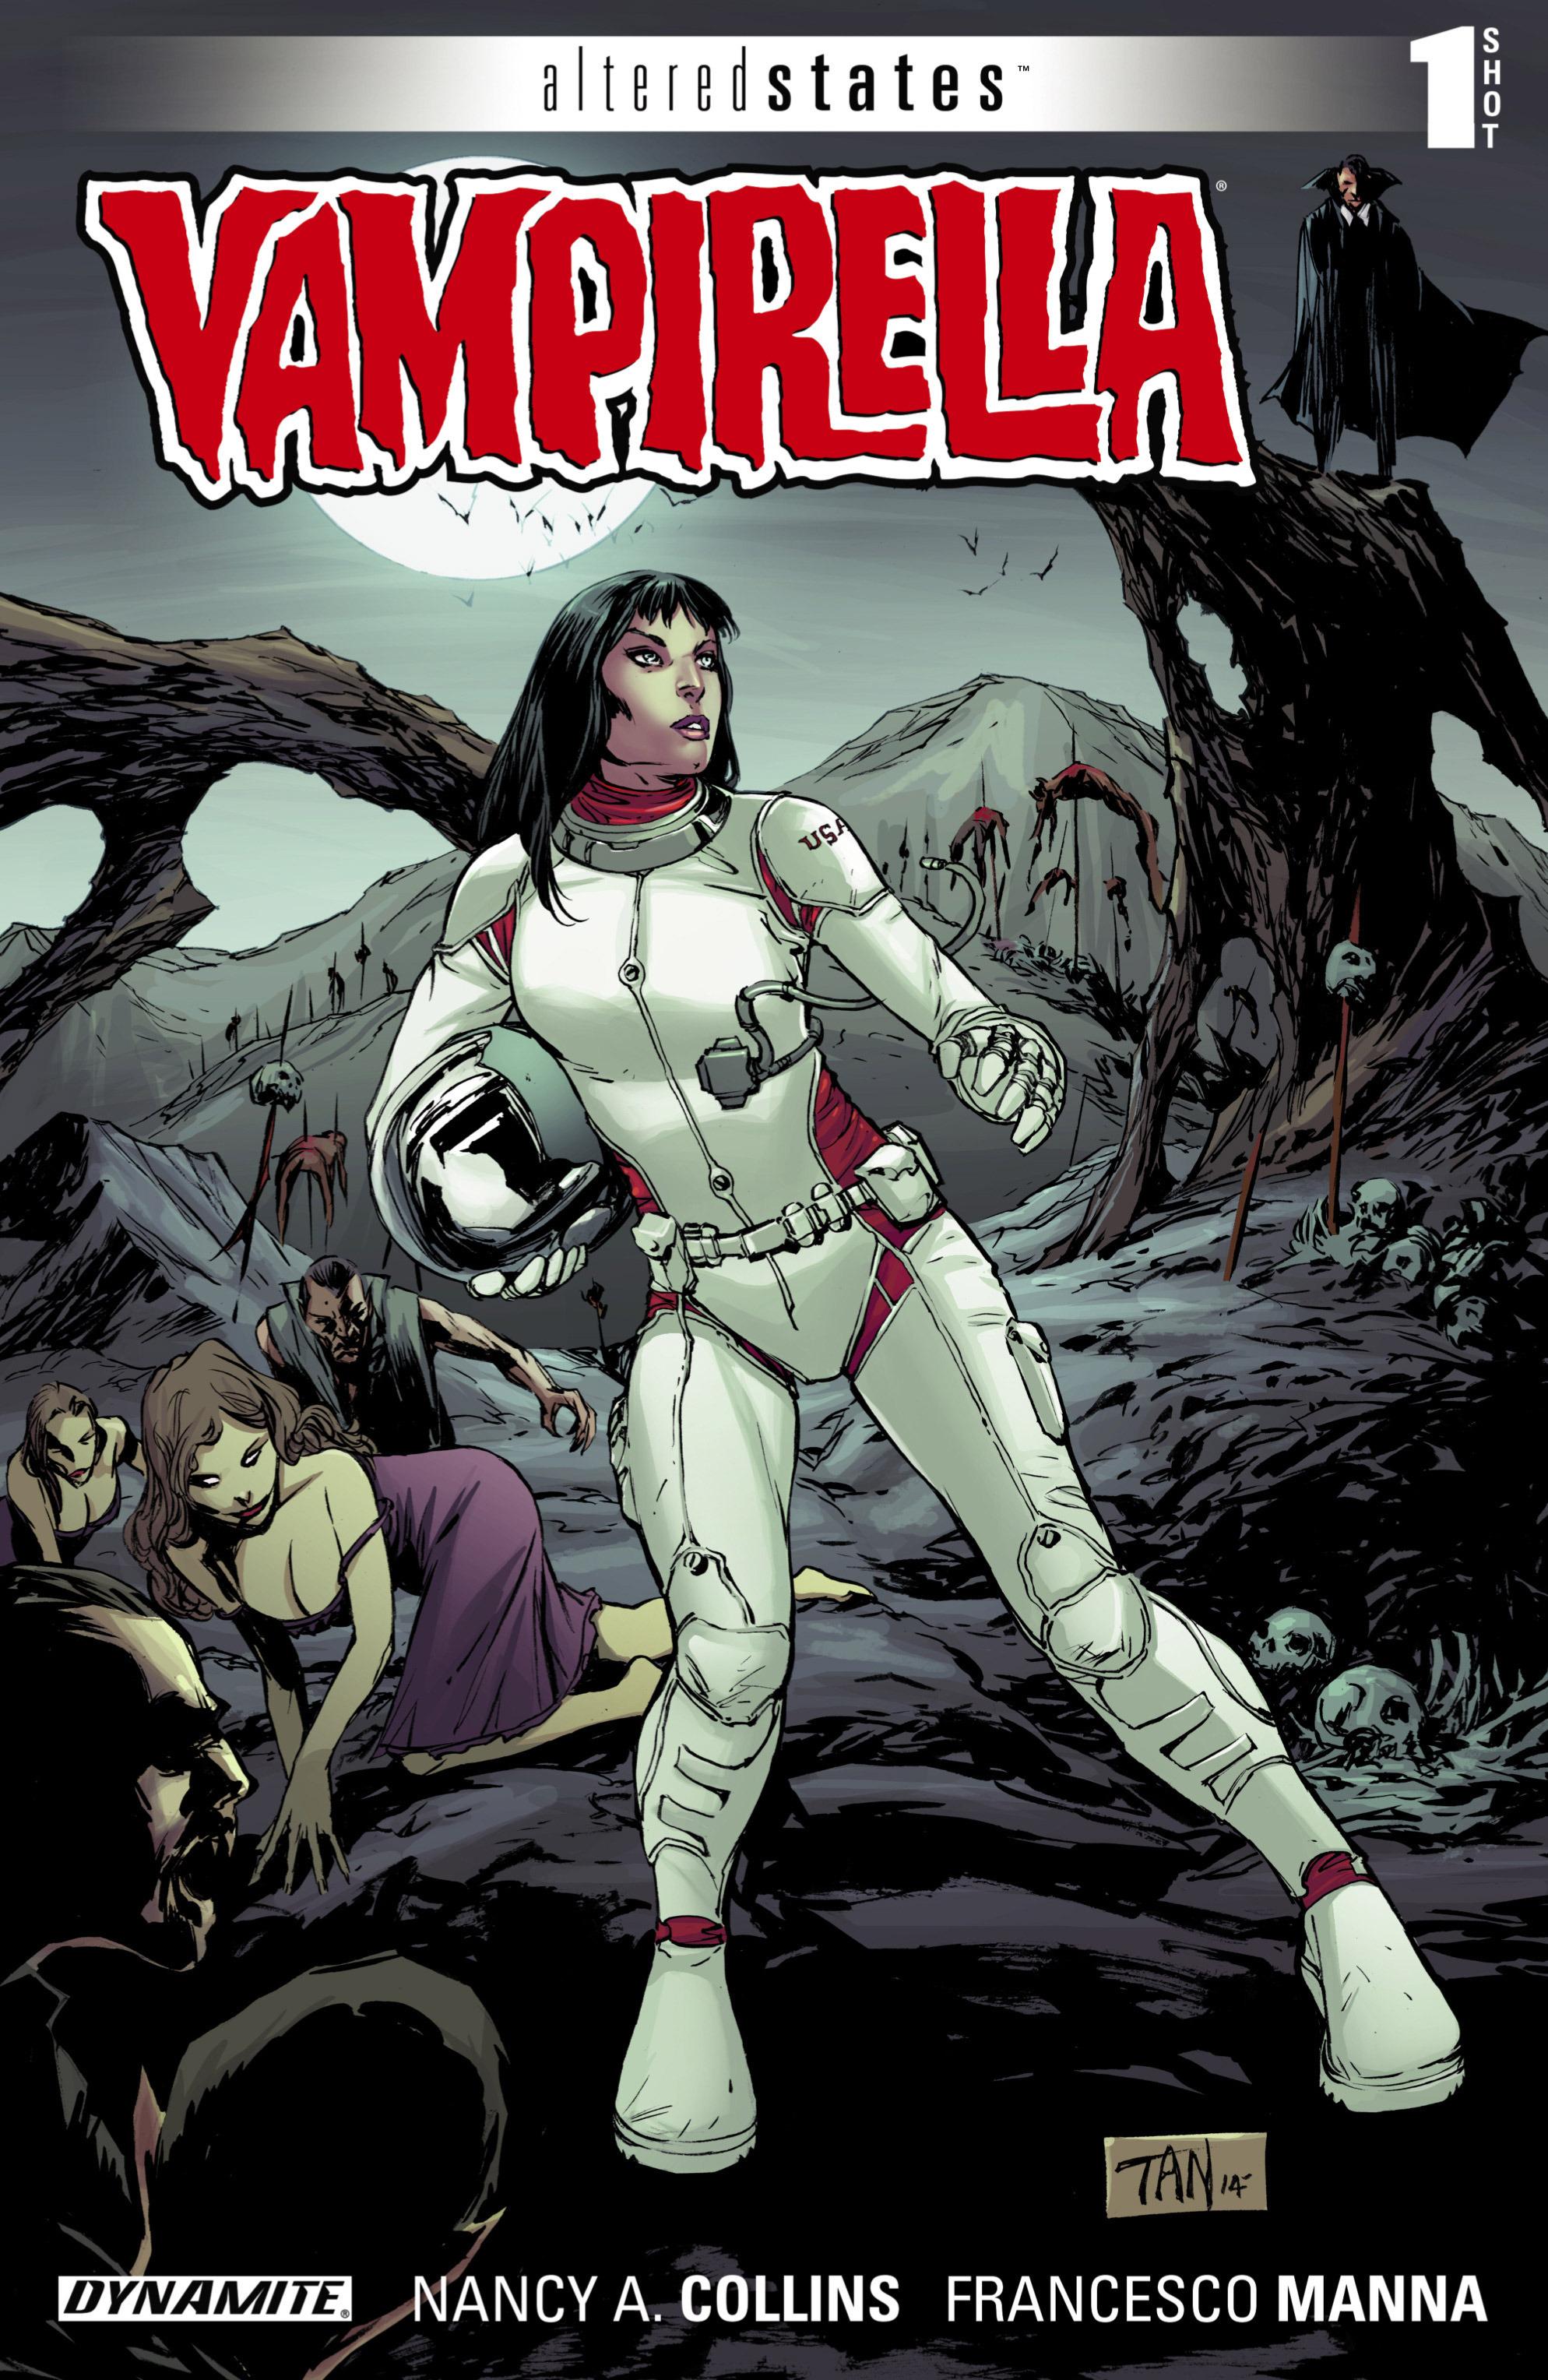 Altered States: Vampirella Full Page 1